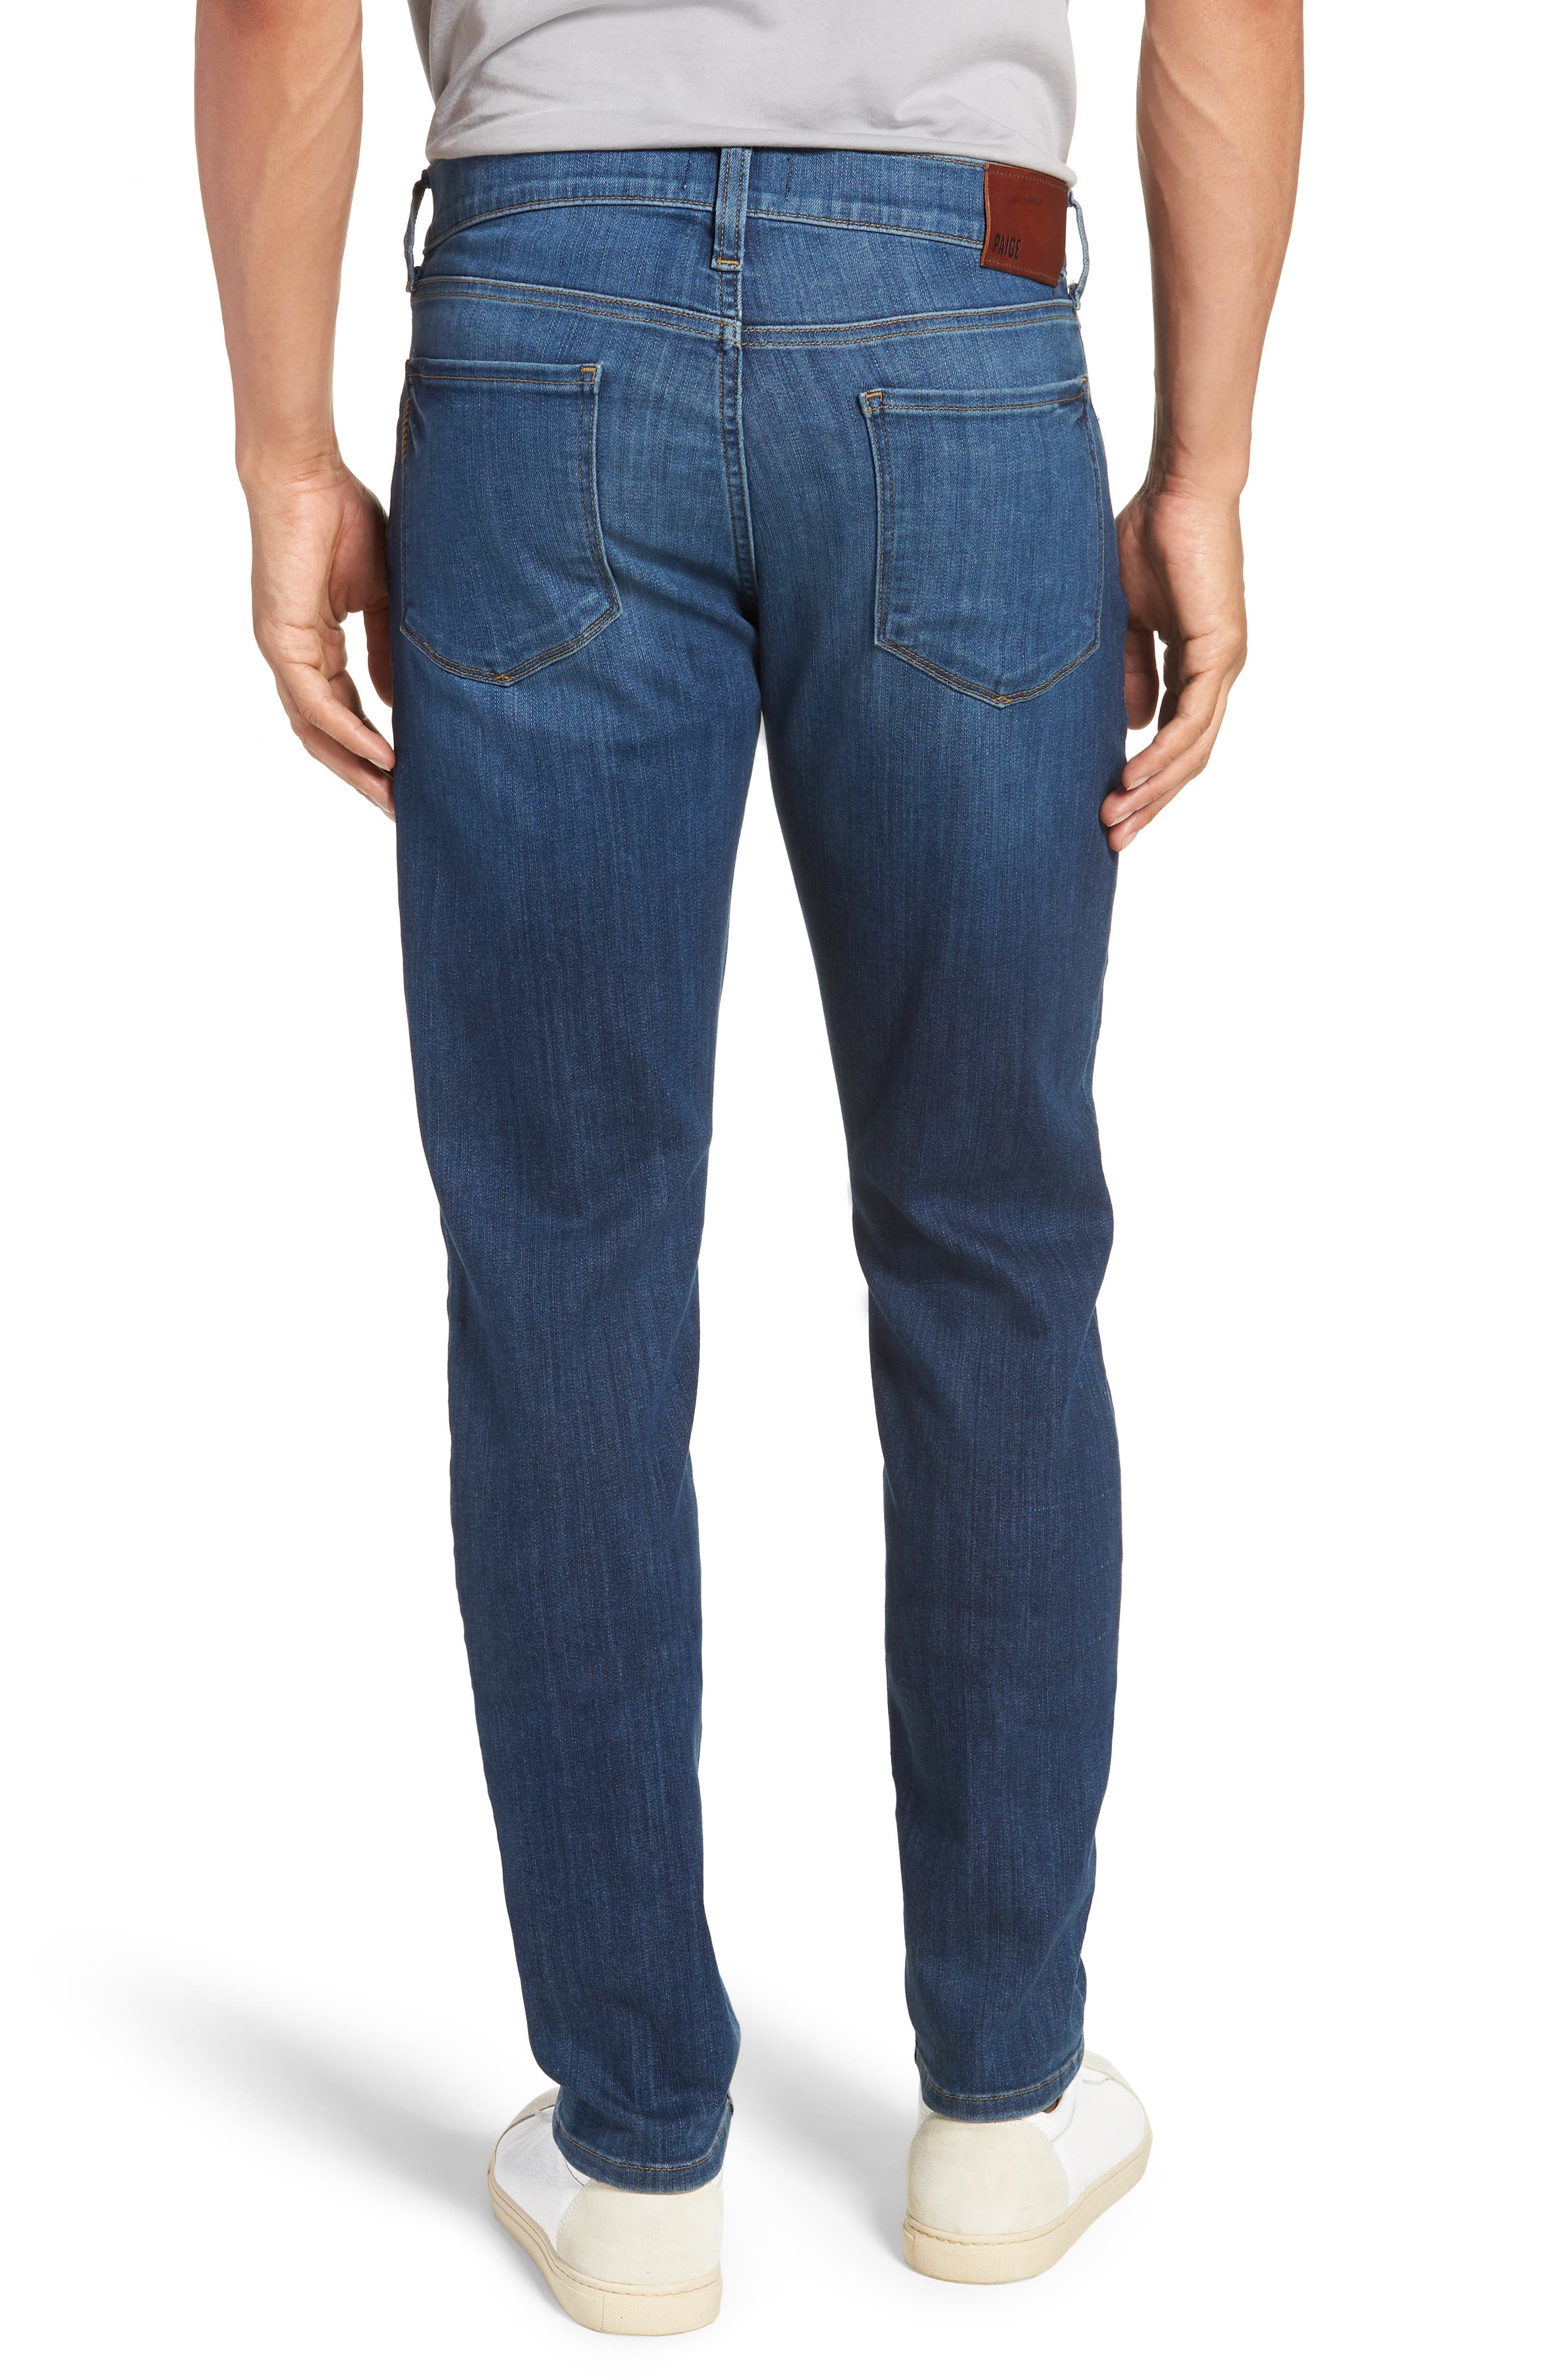 Transcend - Lennox Slim Fit Jeans,                             Alternate thumbnail 2, color,                             Ashbrook